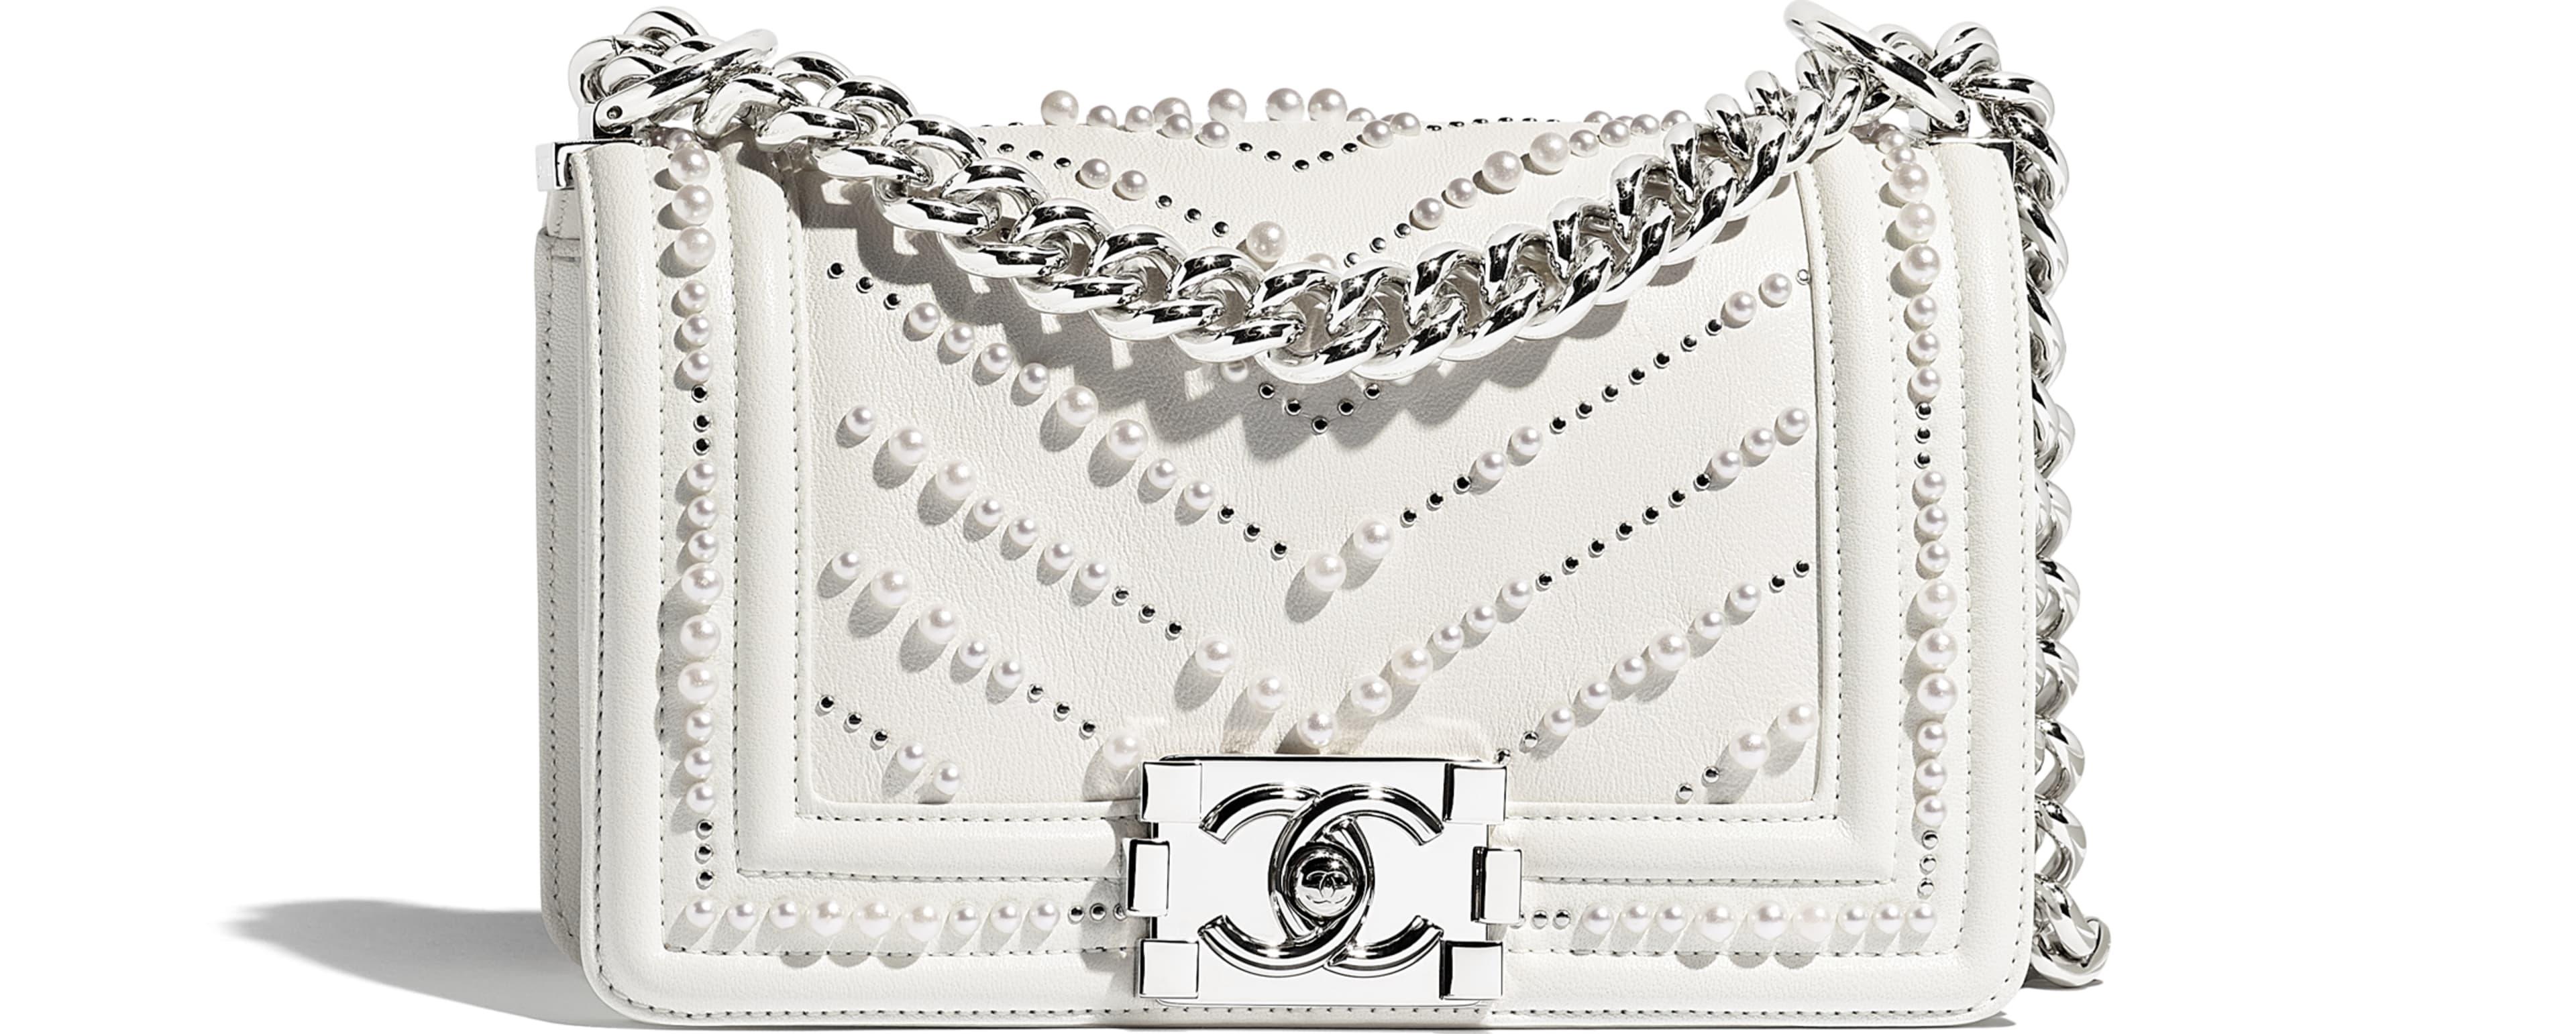 Calfskin, Imitation Pearls & Silver-Tone Metal White